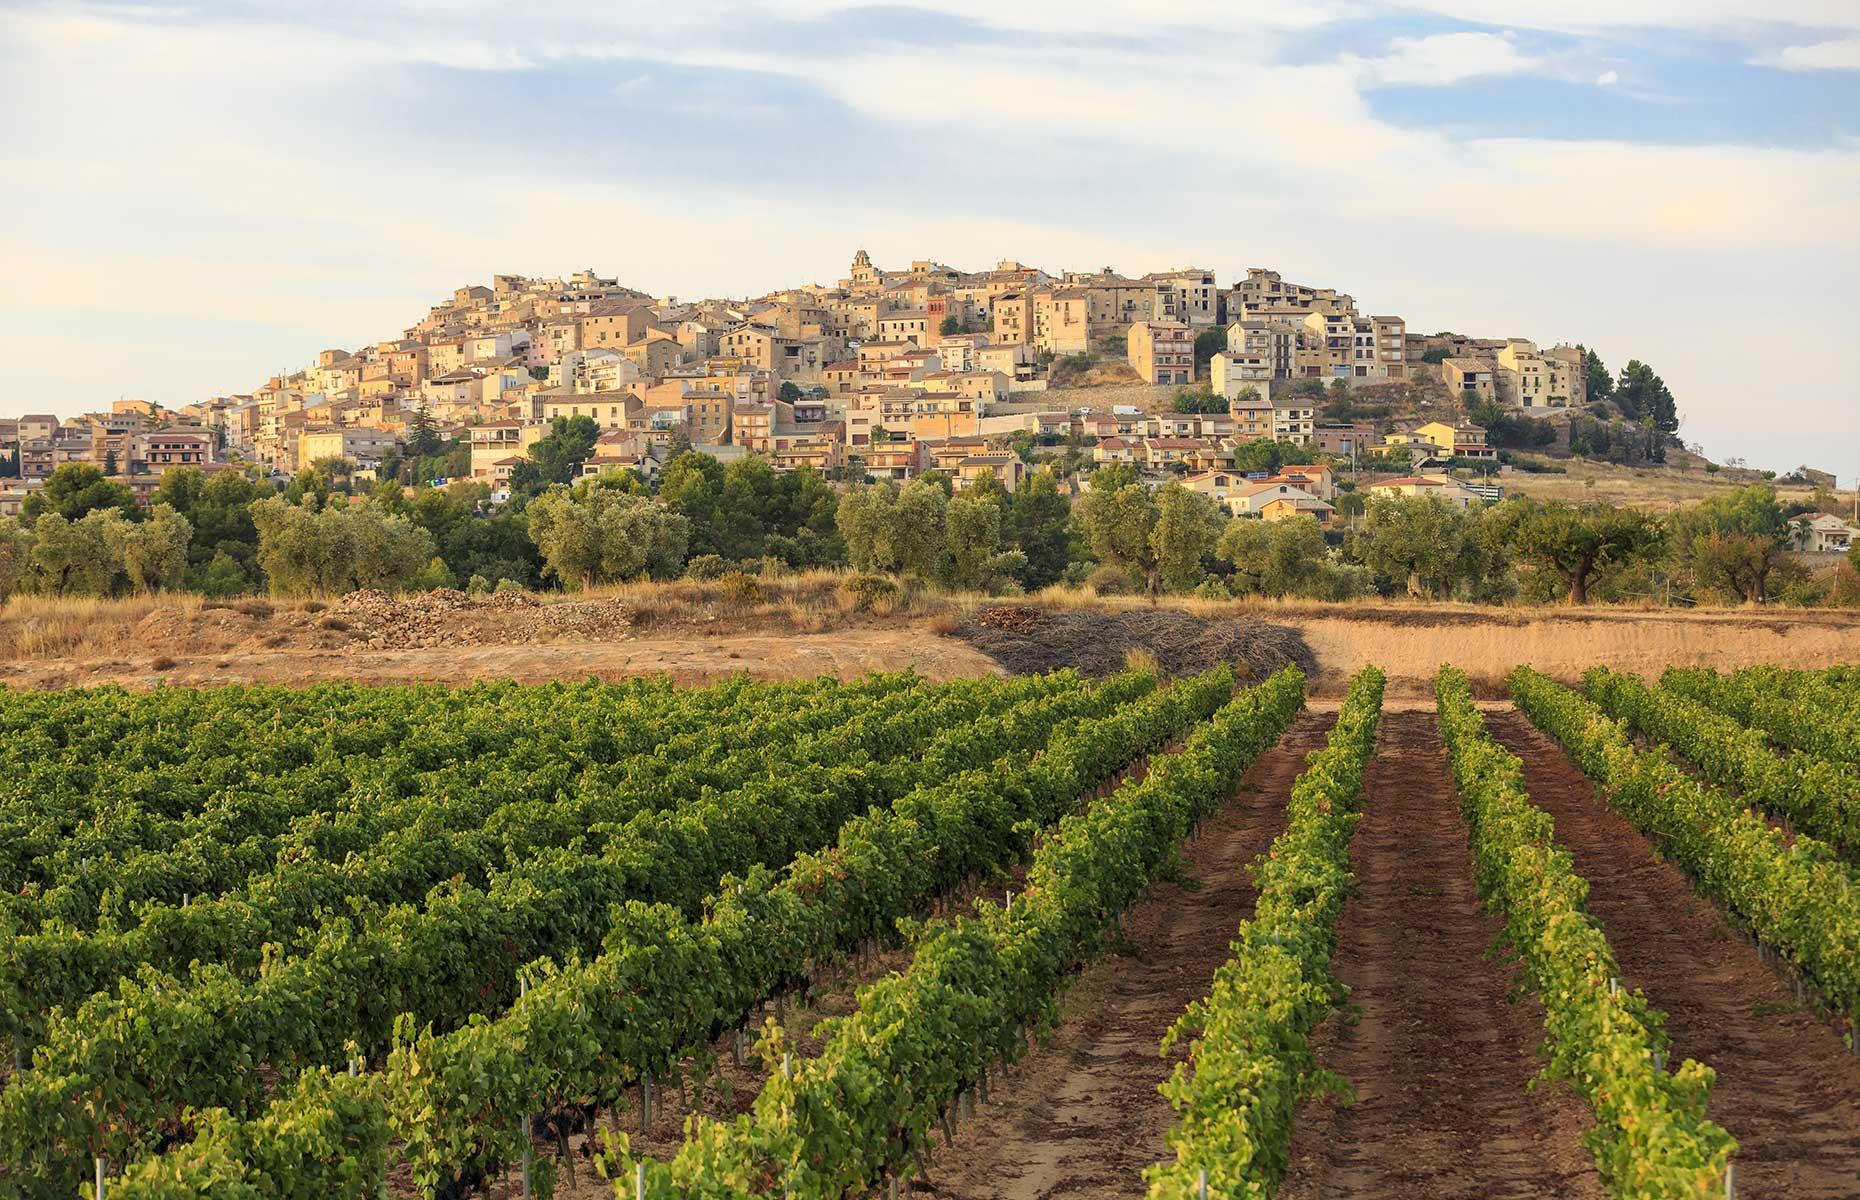 Horta de Sant Joan in Catalonia, Spain (Image: David Ortega Baglietto/Shutterstock)